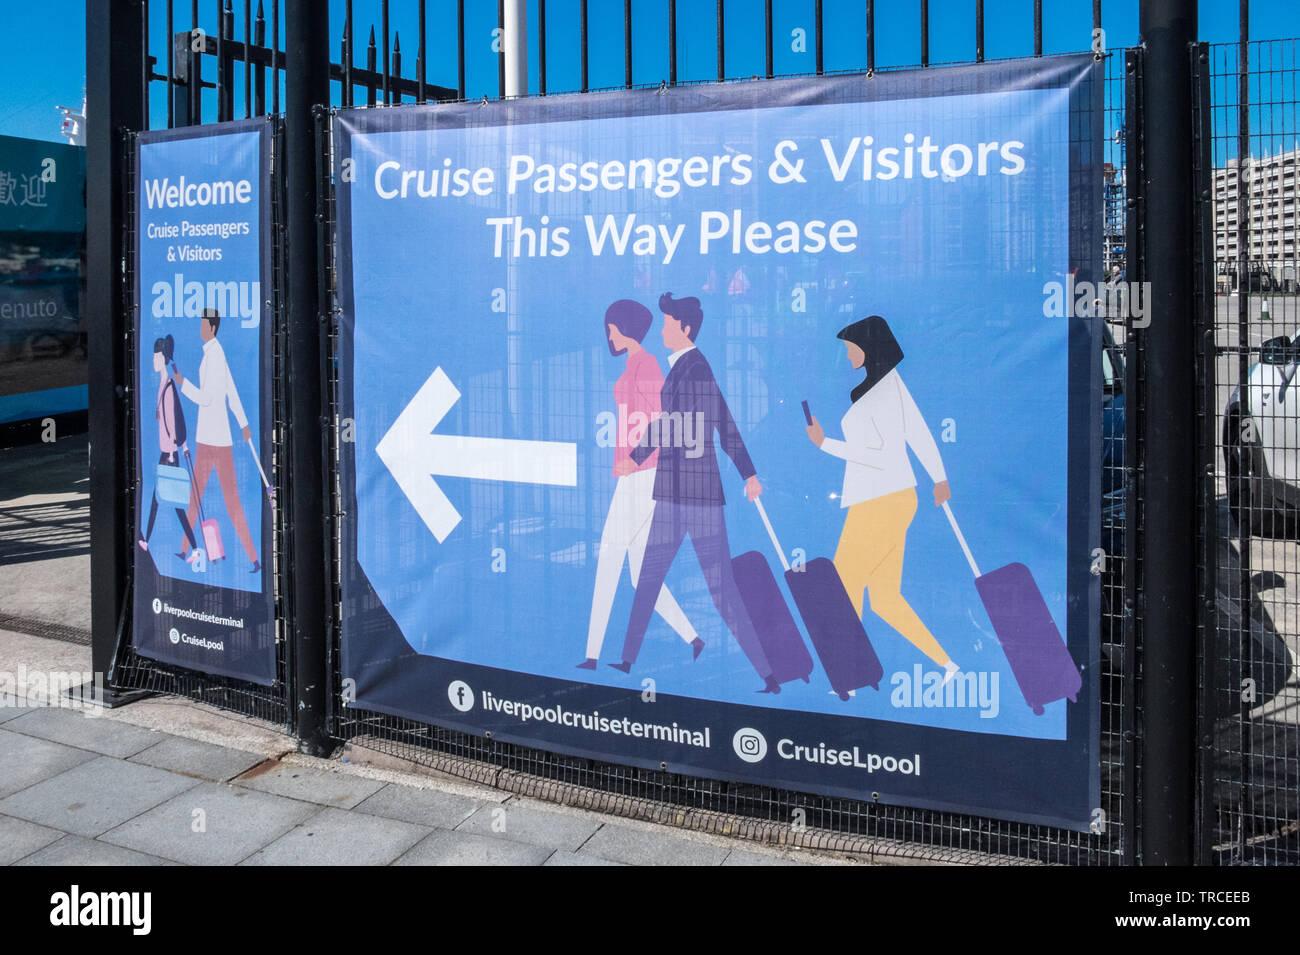 Cruise,passenger,terminal,ship,boat,River Mersey,waterfront,Liverpool,Merseyside,England,GB,UK,Great Britain,British - Stock Image